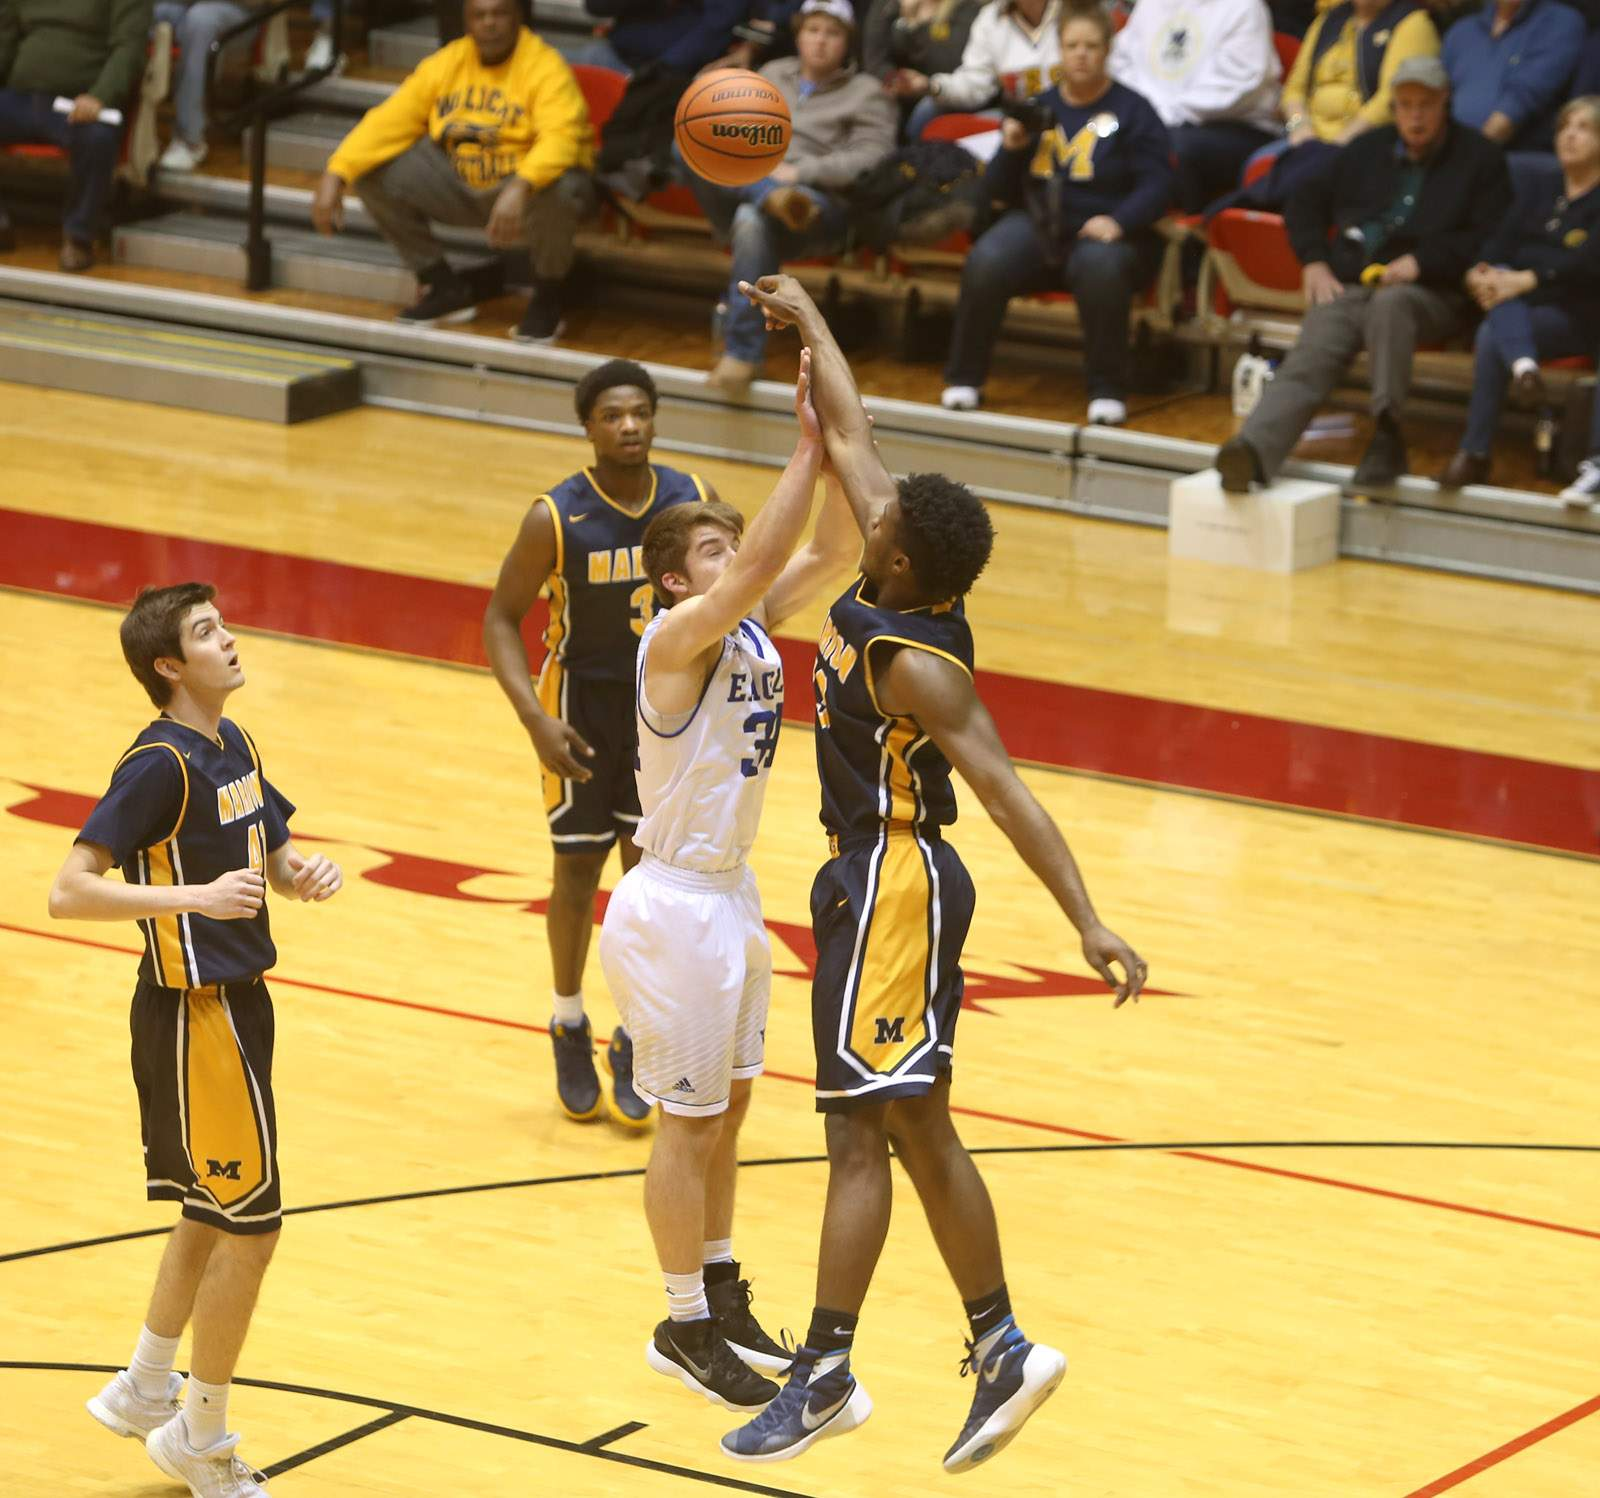 Terrell Henderson blocks a shot.